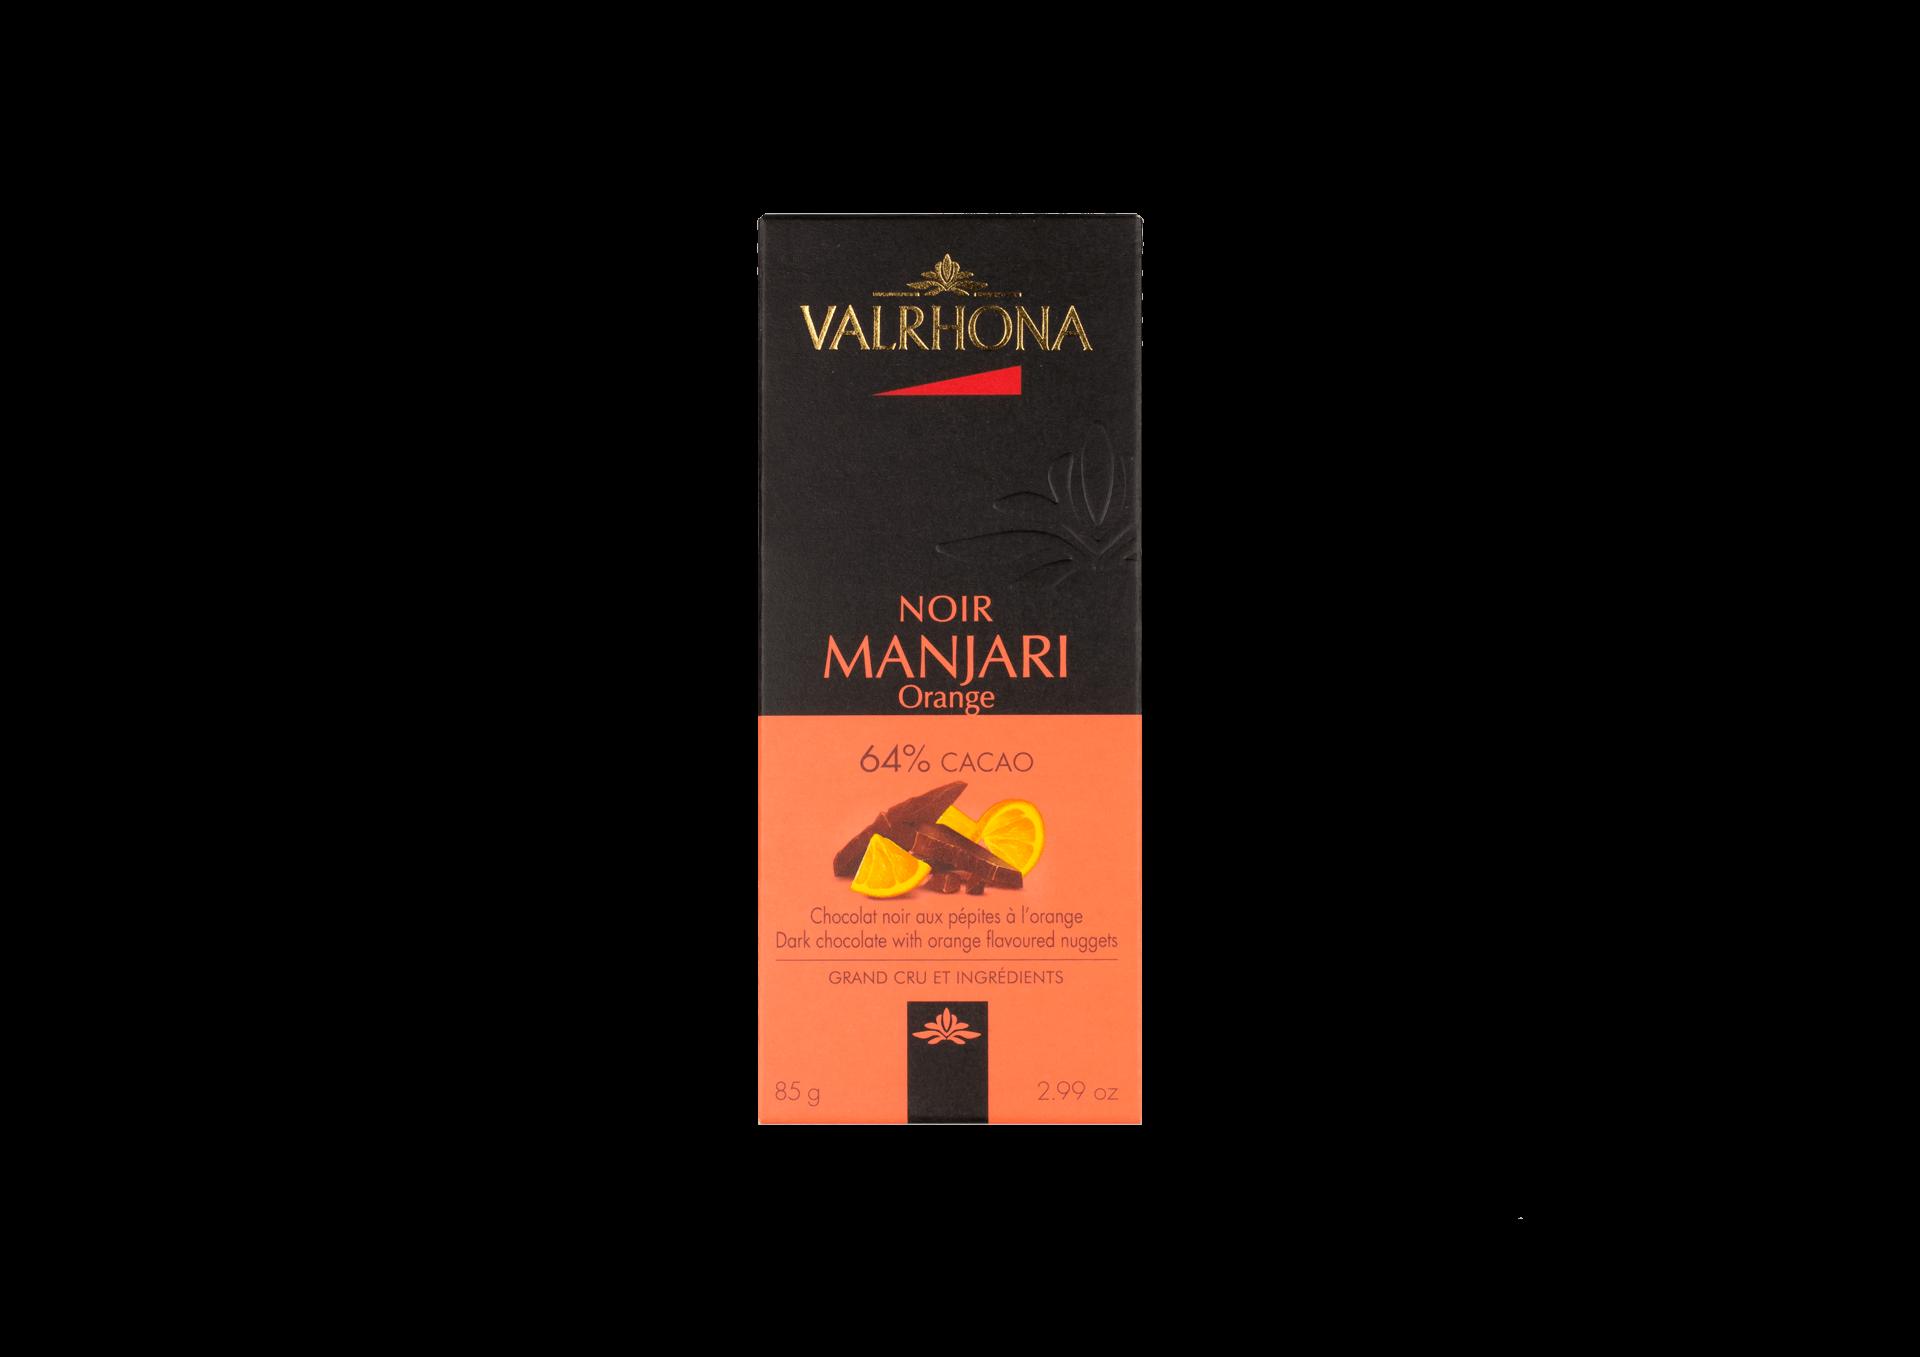 Valrhona Manjari Noir Orange 64%